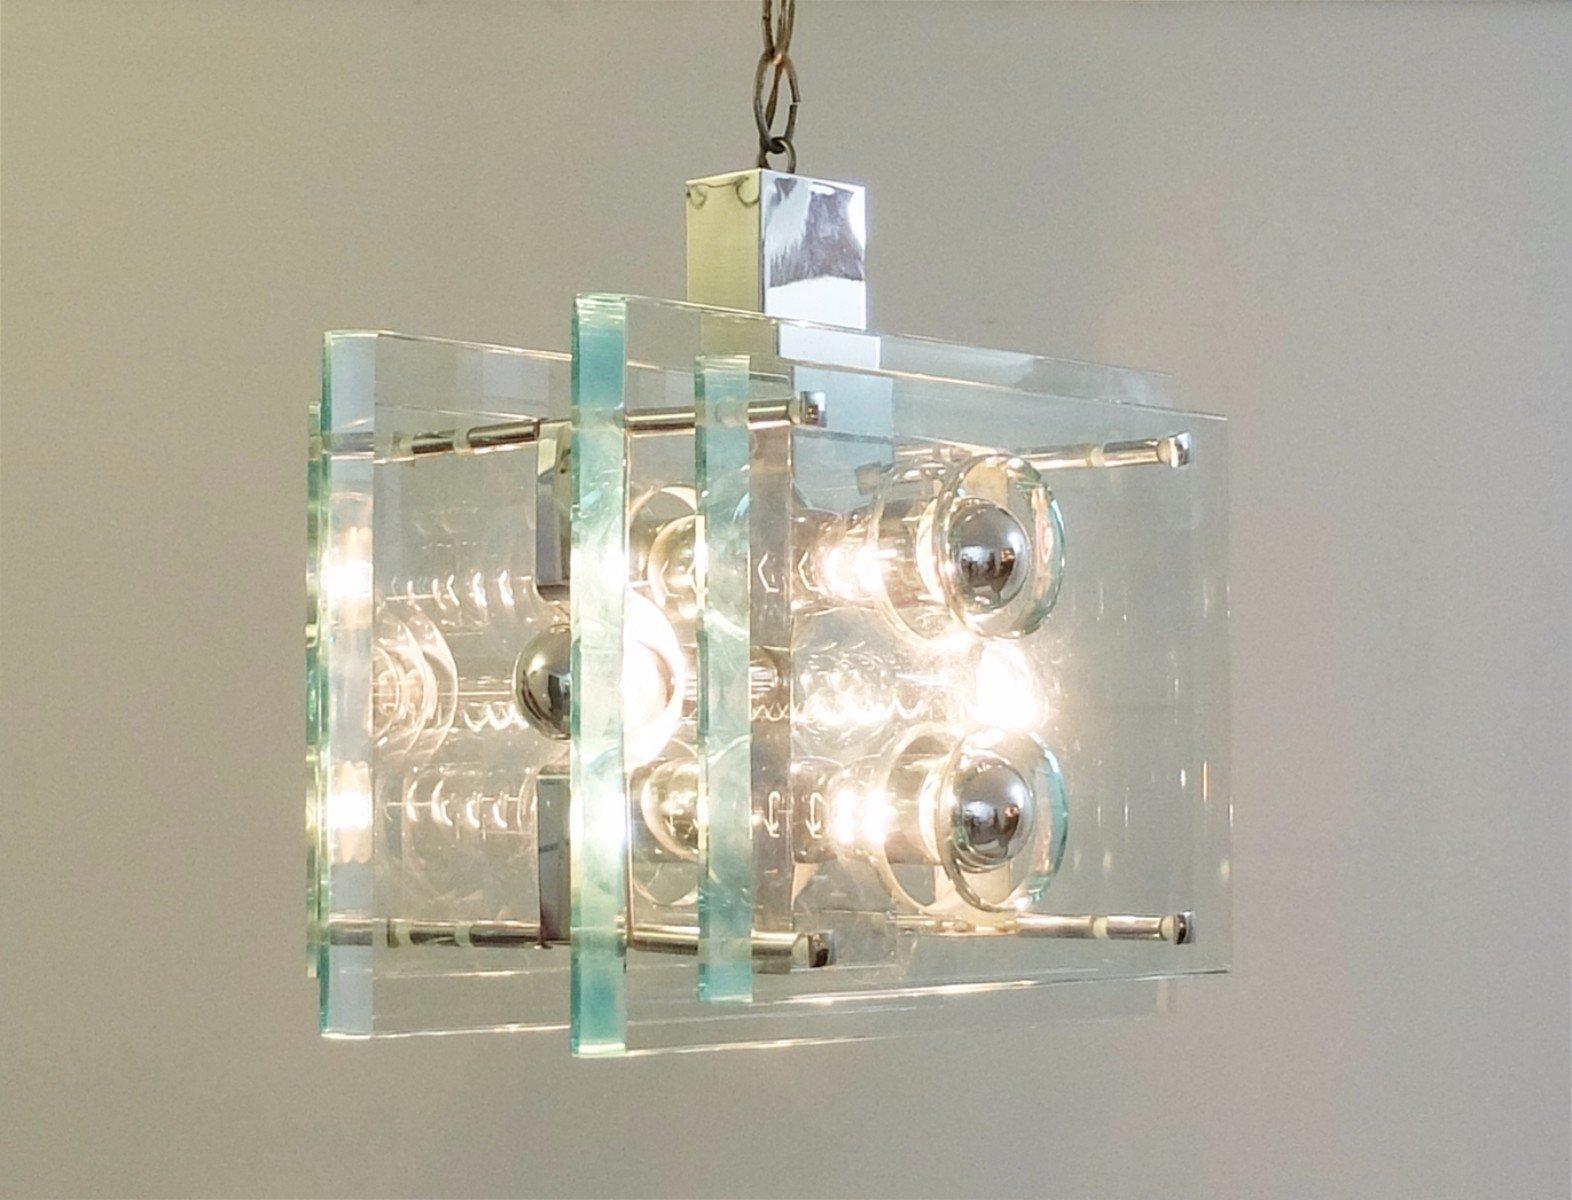 Lampada Sospensione Vetro Metallo Alien : Lampada a sospensione luci in metallo cromato e vetro